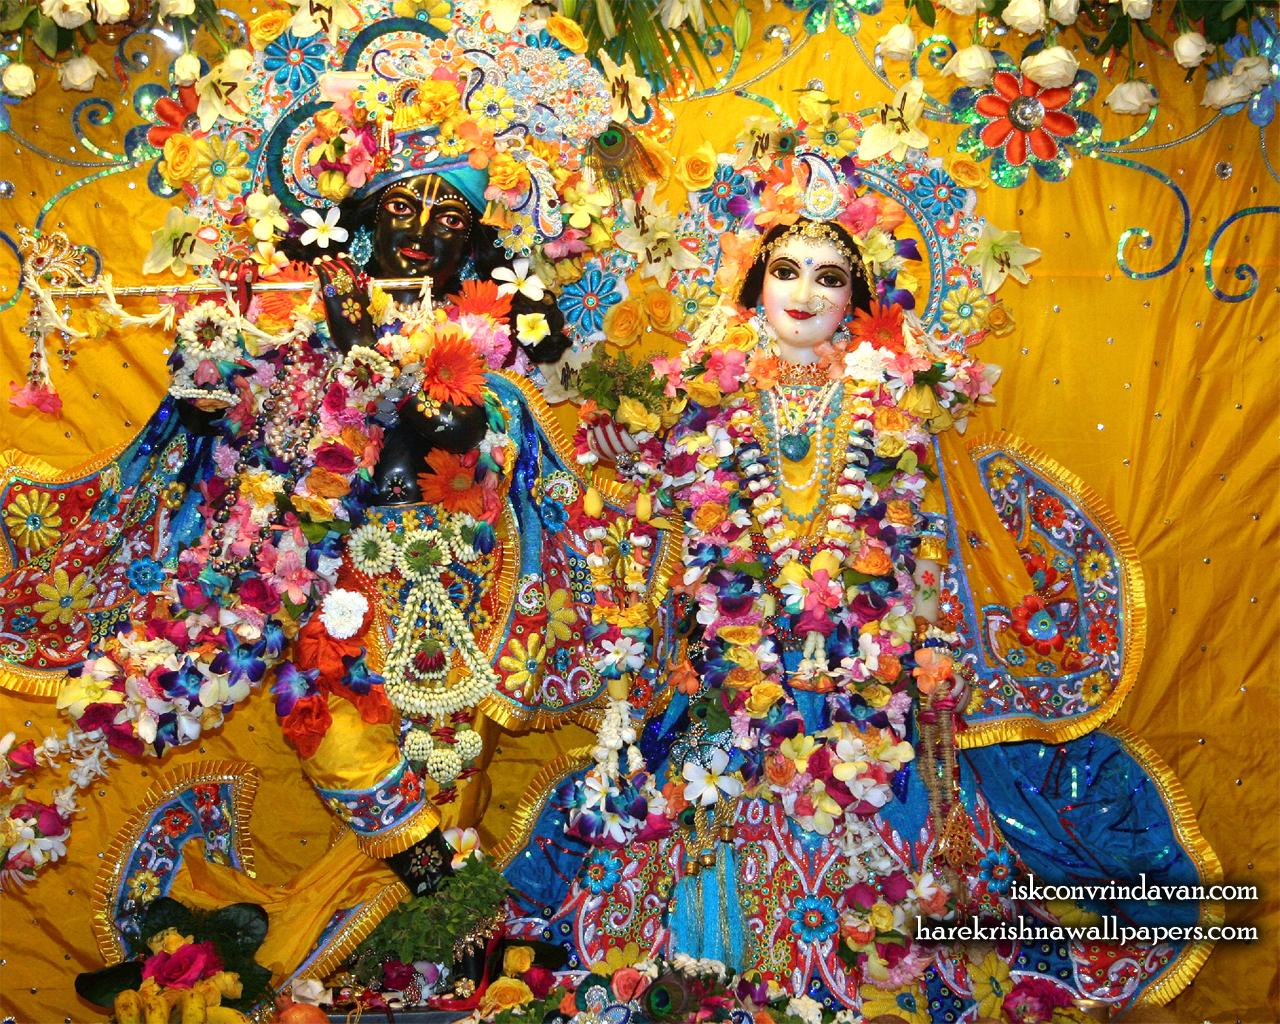 Sri Sri Radha Shyamsundar Wallpaper (013) Size 1280x1024 Download